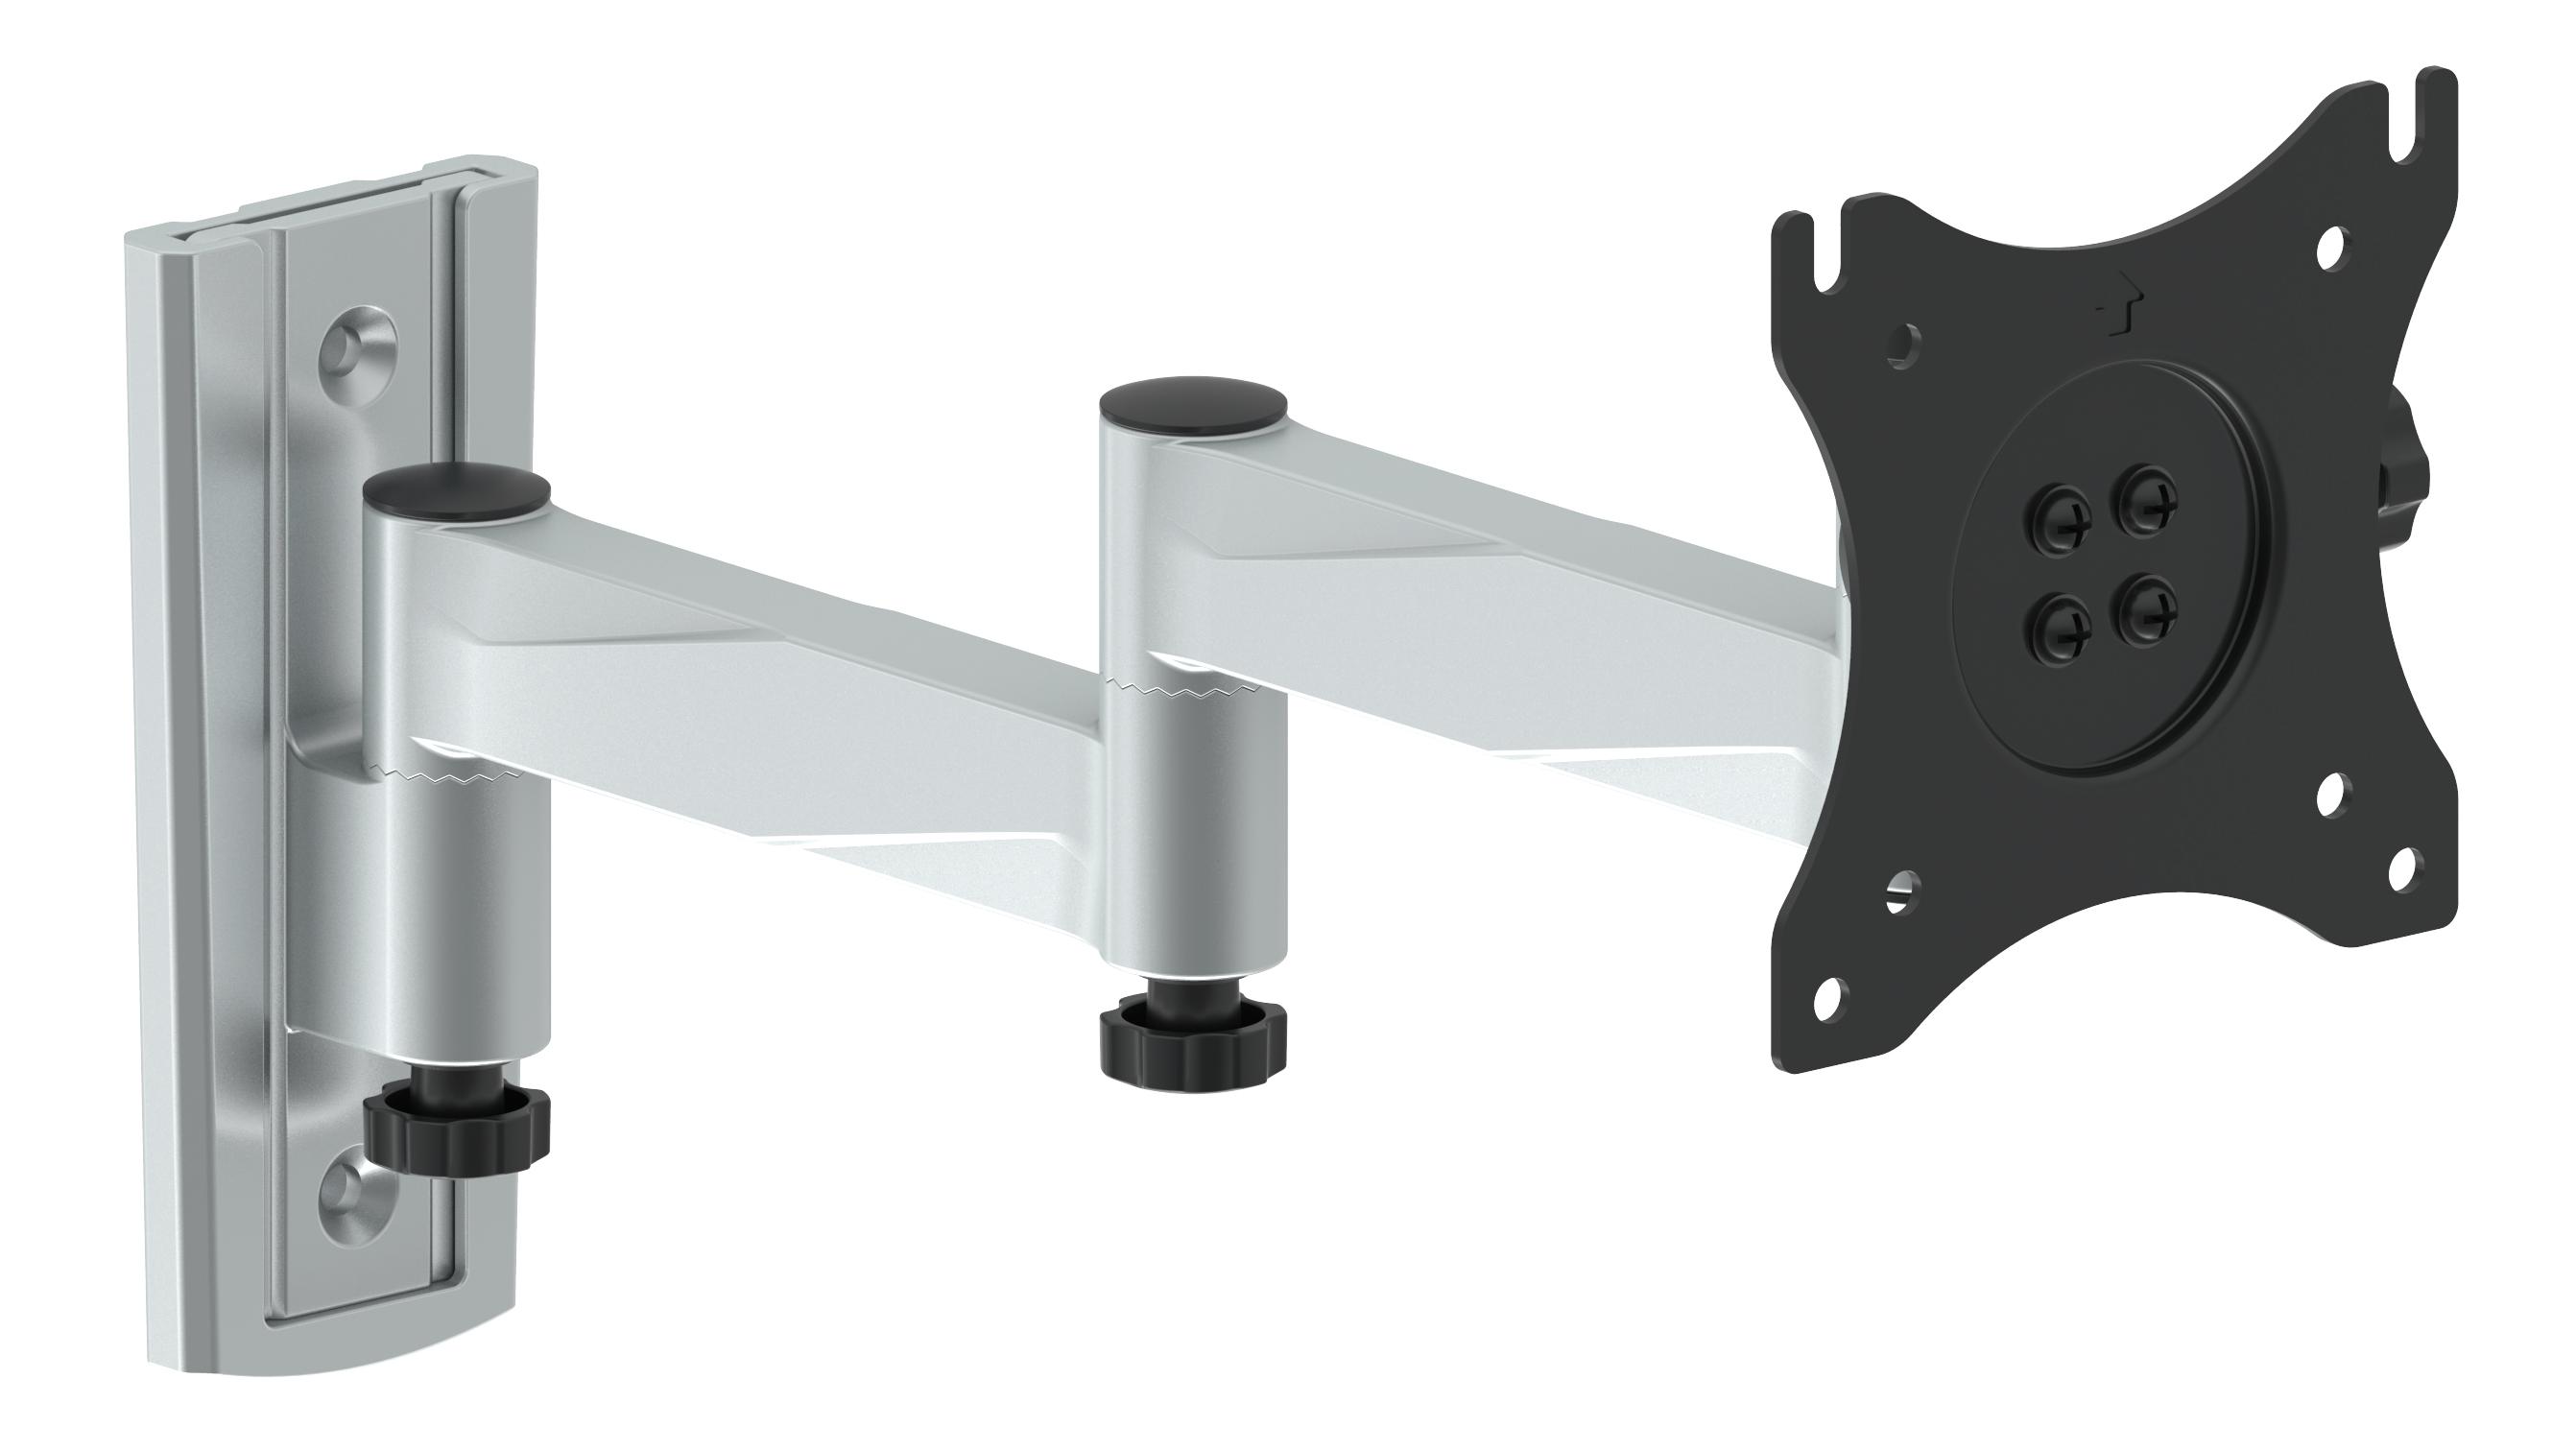 arm 530 epzi wall mount for tv monitor 13 27 3led vesa 100 silver black. Black Bedroom Furniture Sets. Home Design Ideas